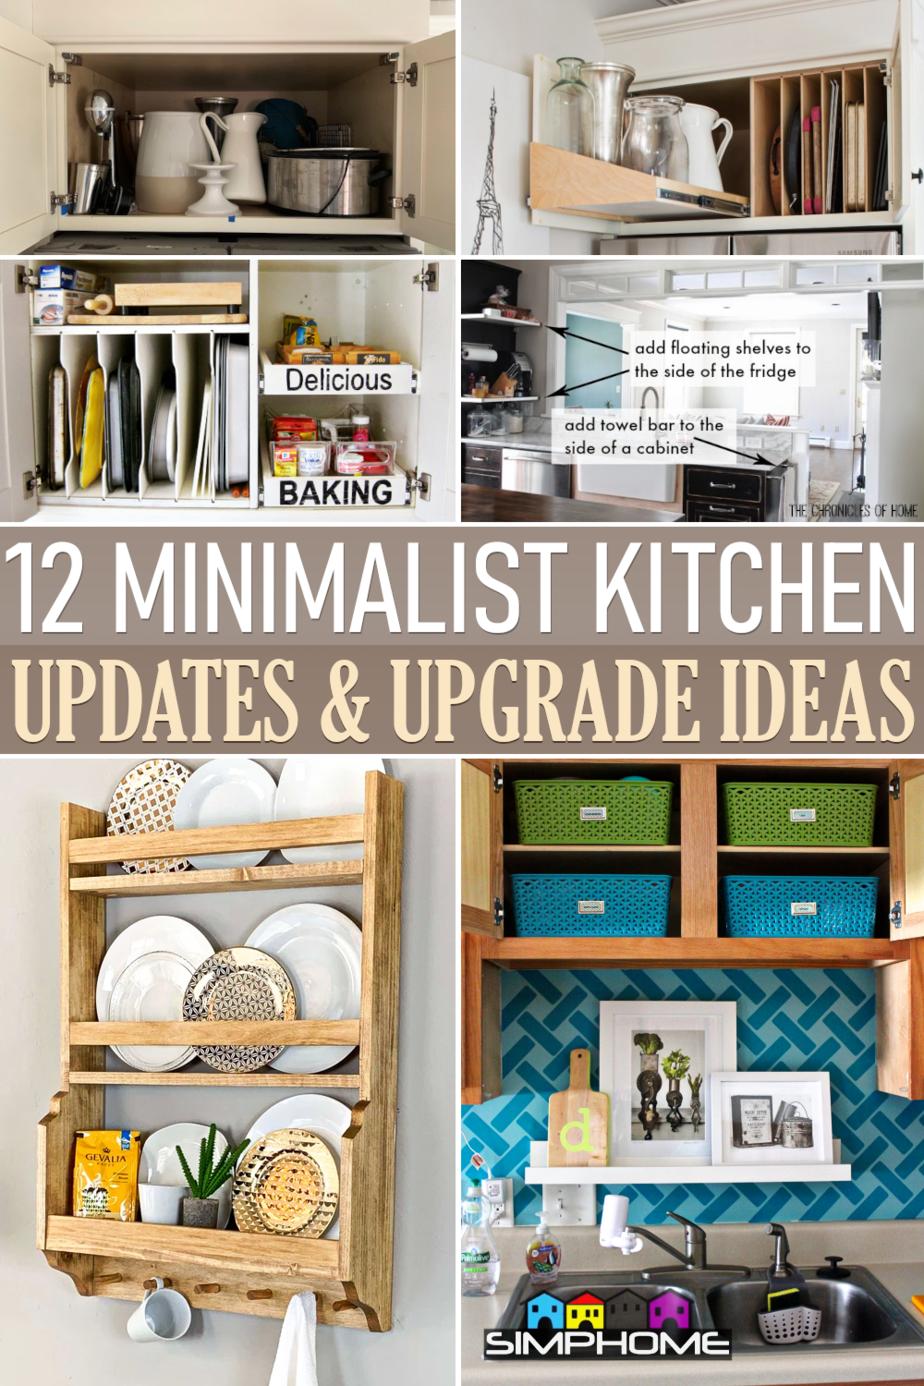 12 Minimalist Kitchen Optimization and Organizations via Simphome.comFeatured